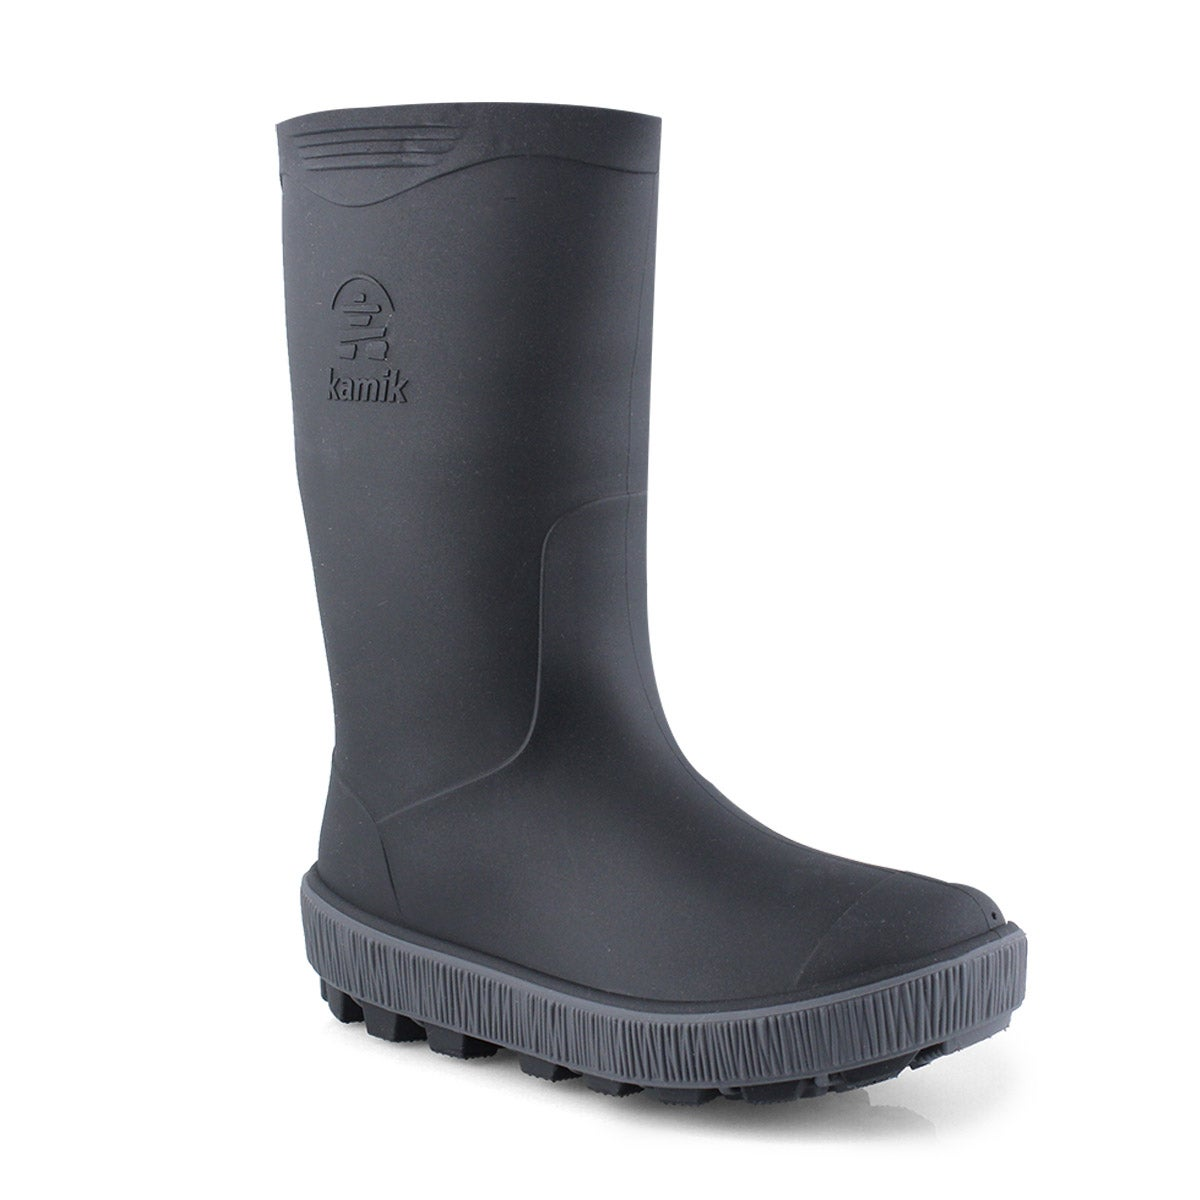 Bys Riptide blk/charcoal wtpf rain boot